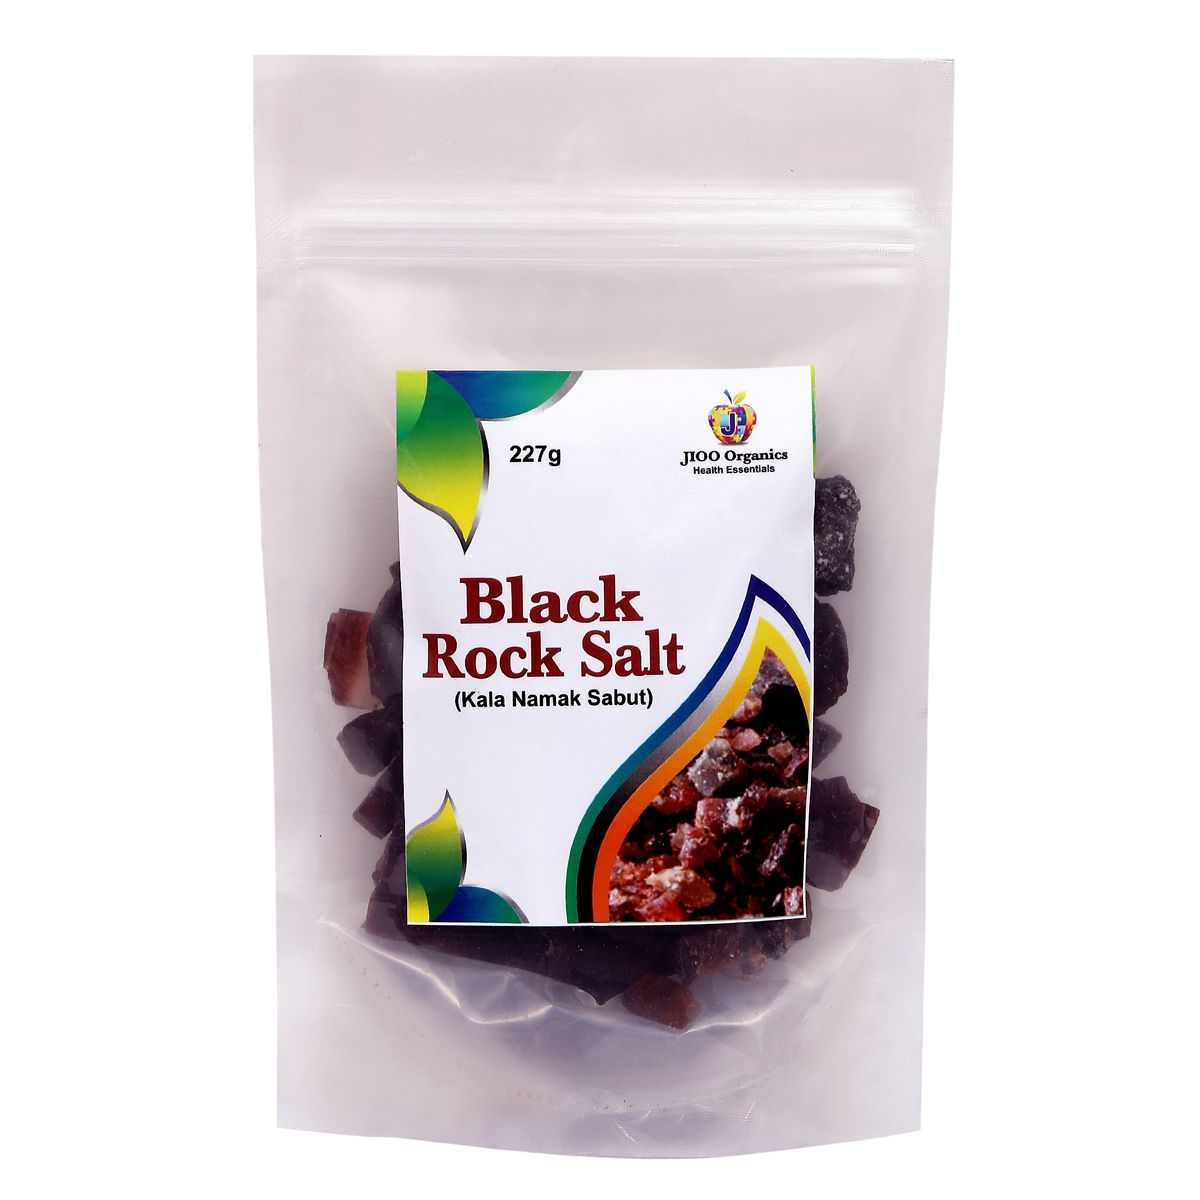 Jioo Organics Black Rock Salt Black Salt 227 gm